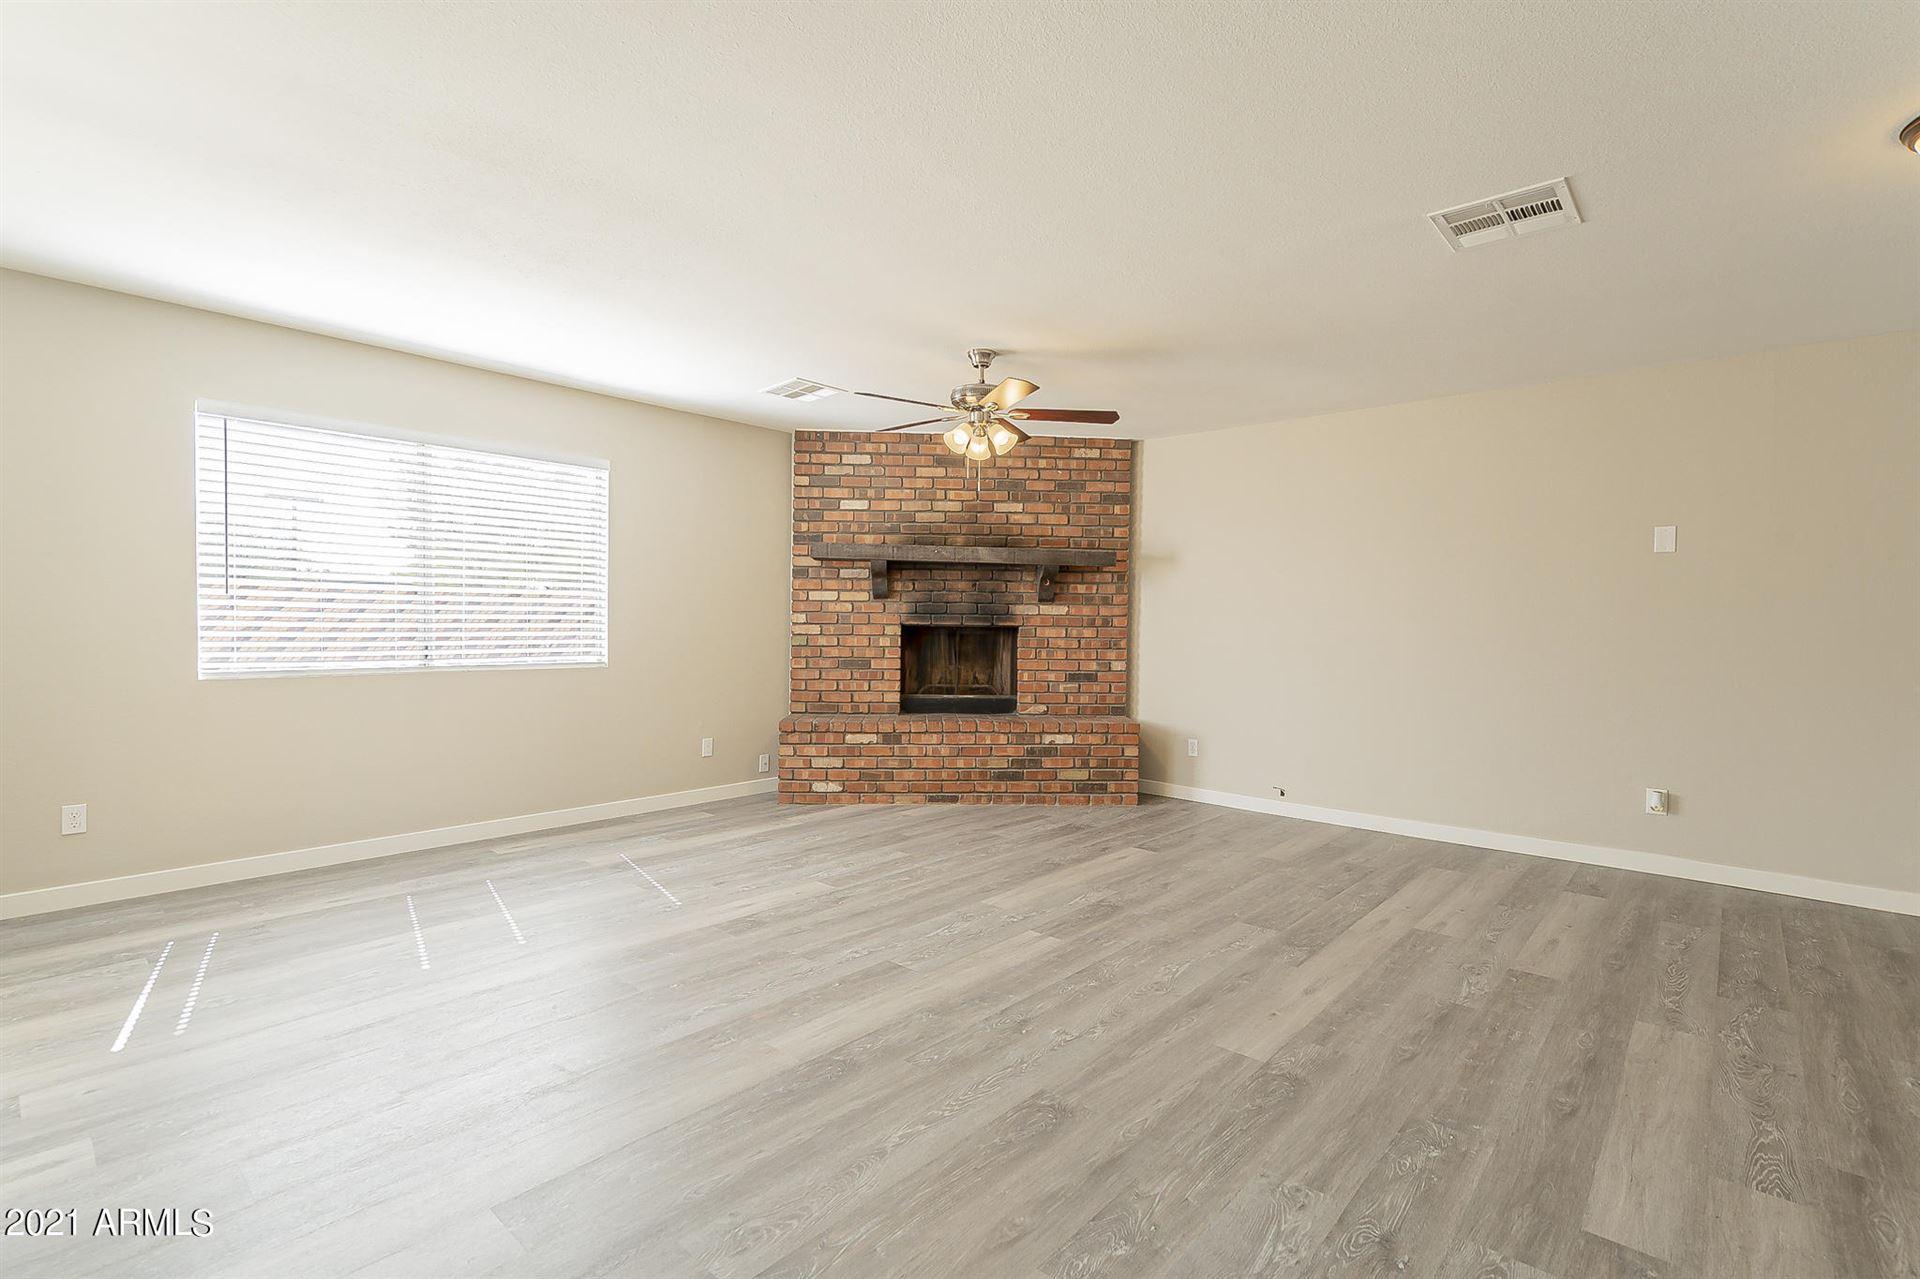 Photo of 1147 E 10TH Avenue, Mesa, AZ 85204 (MLS # 6200774)